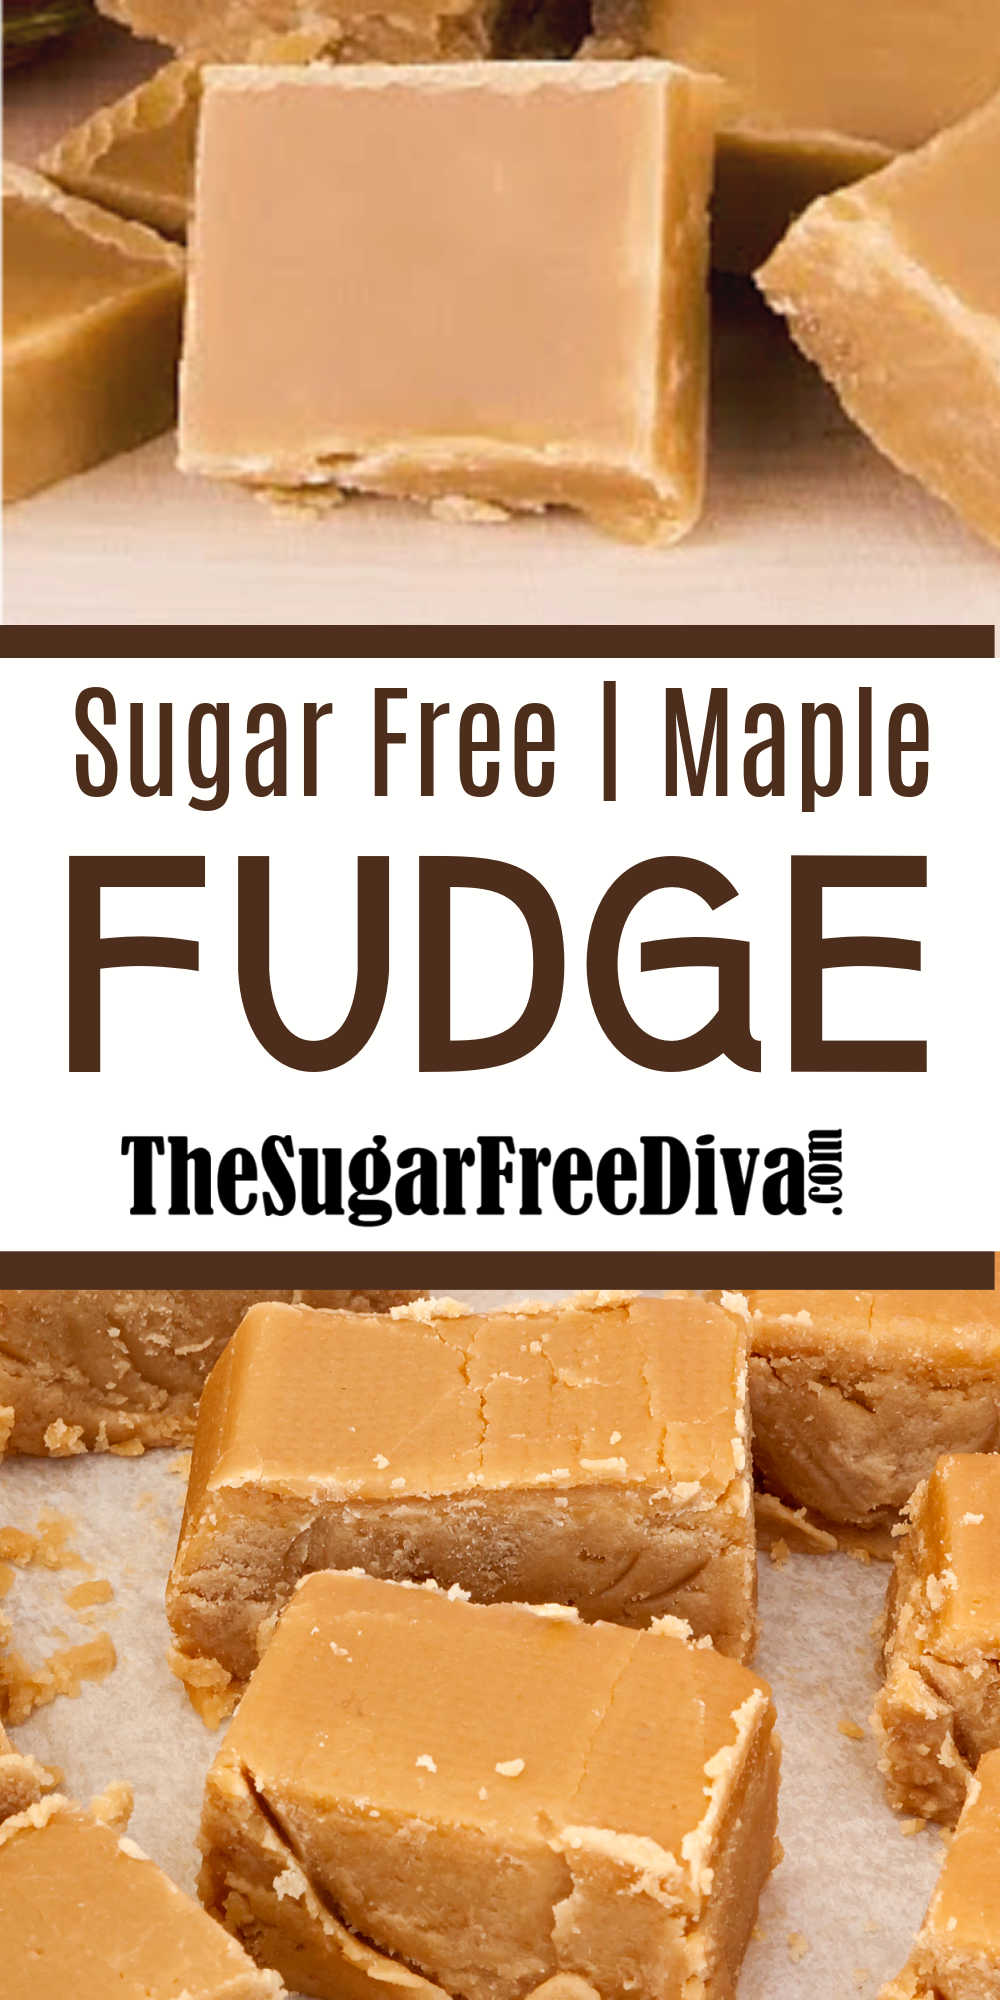 Sugar Free Maple Fudge